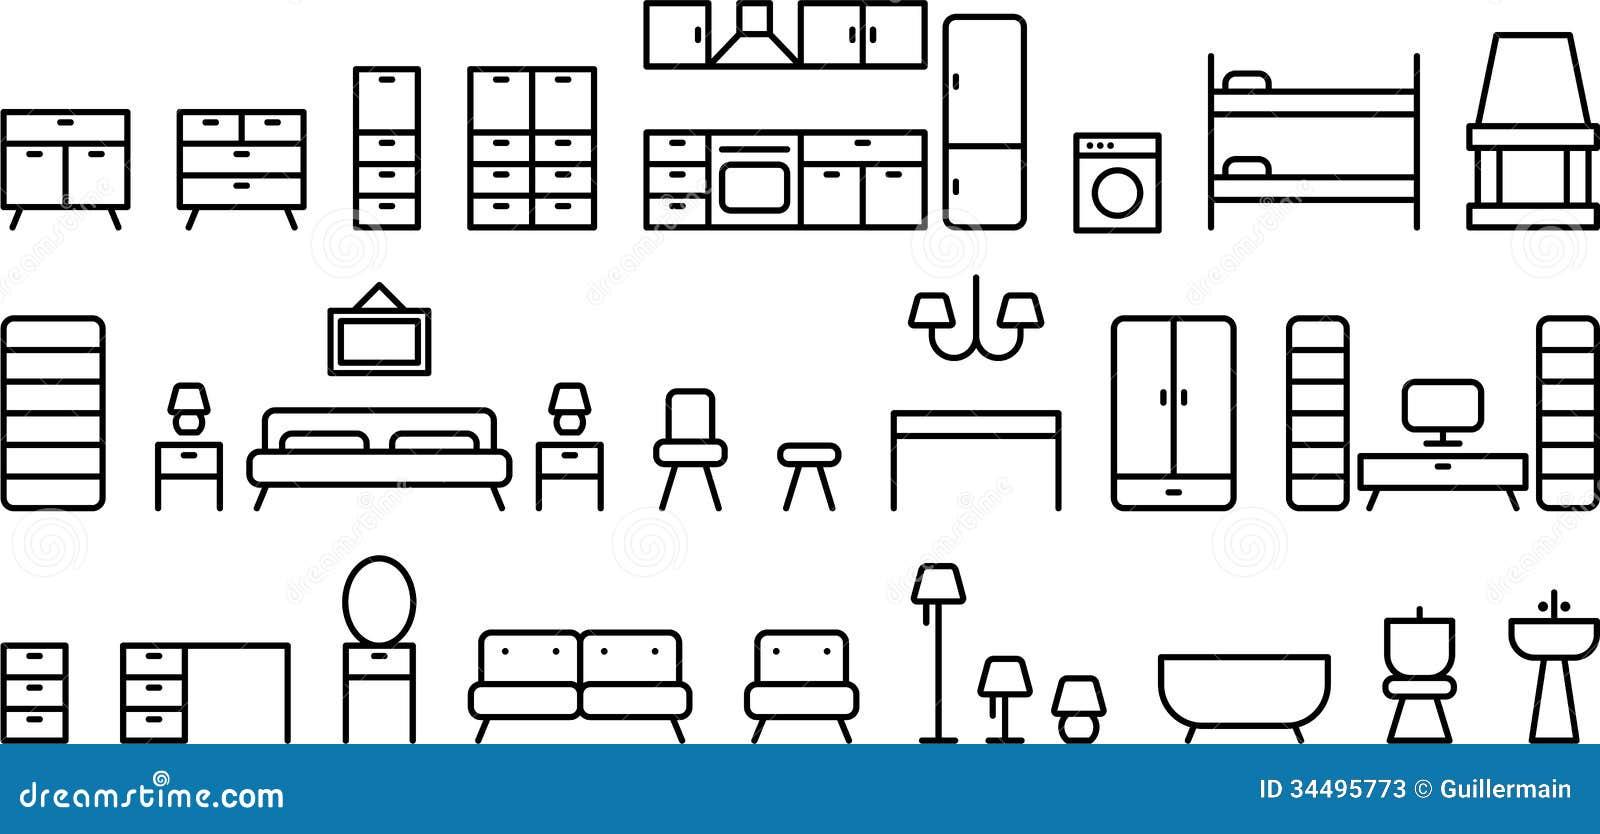 Clipart Furniture Floor Plan Best Free Home Design